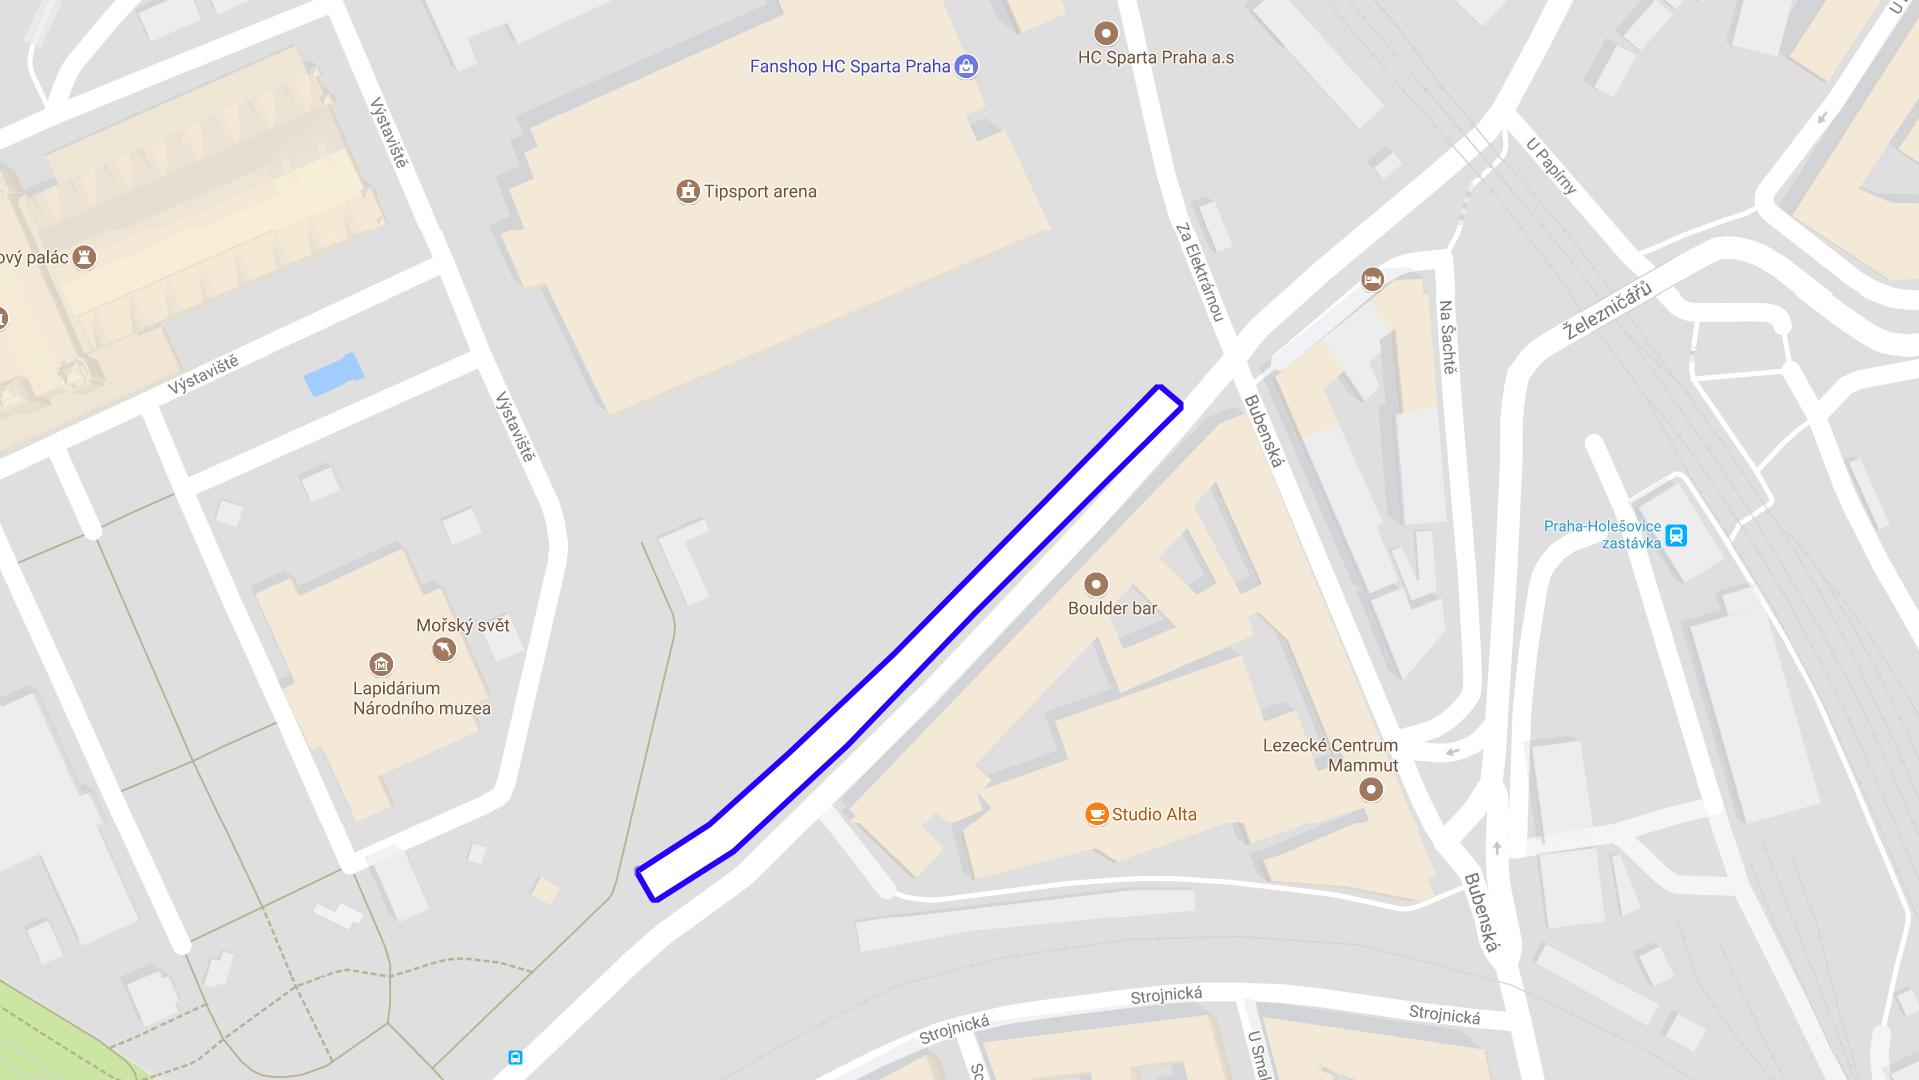 Praha 7 Vyjednala Pro Sve Obcany Nocni Parkovani Pred Vystavistem